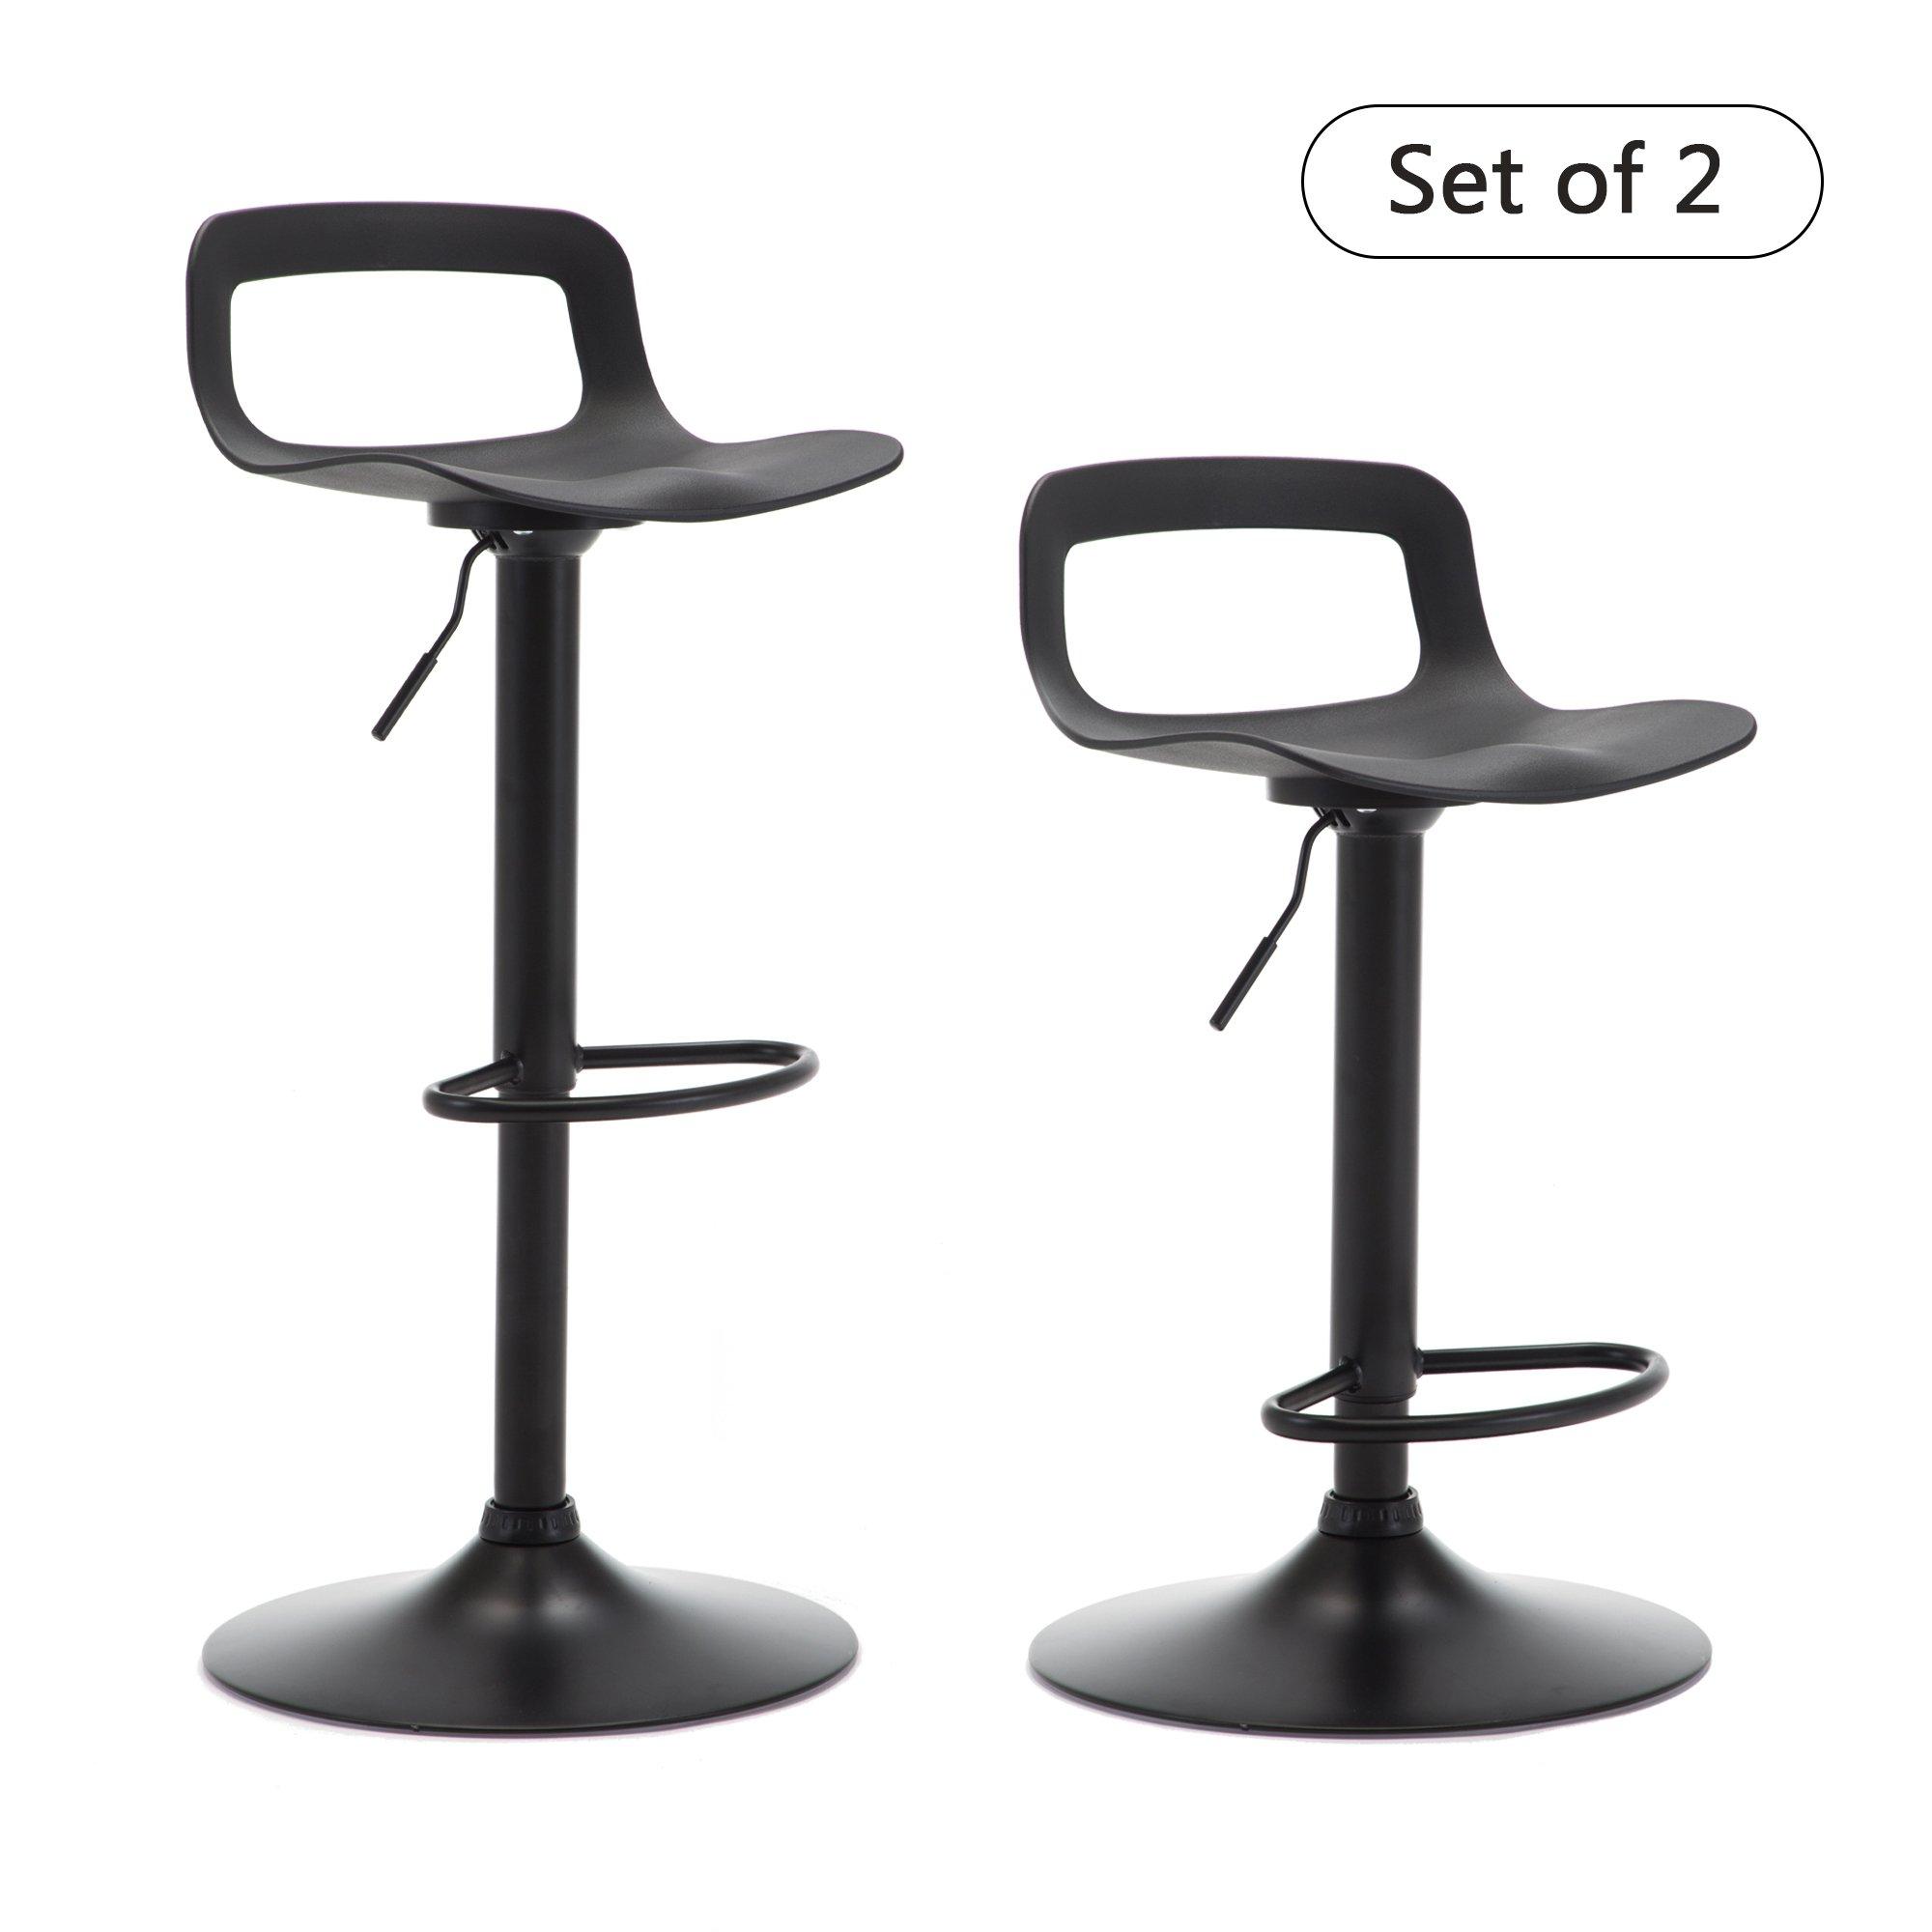 THKSBOUGHT Set of 2 Modern Bar Stools Plastic Adjustable Counter Height Swivel Stool (Matte Back) by THKSBOUGHT